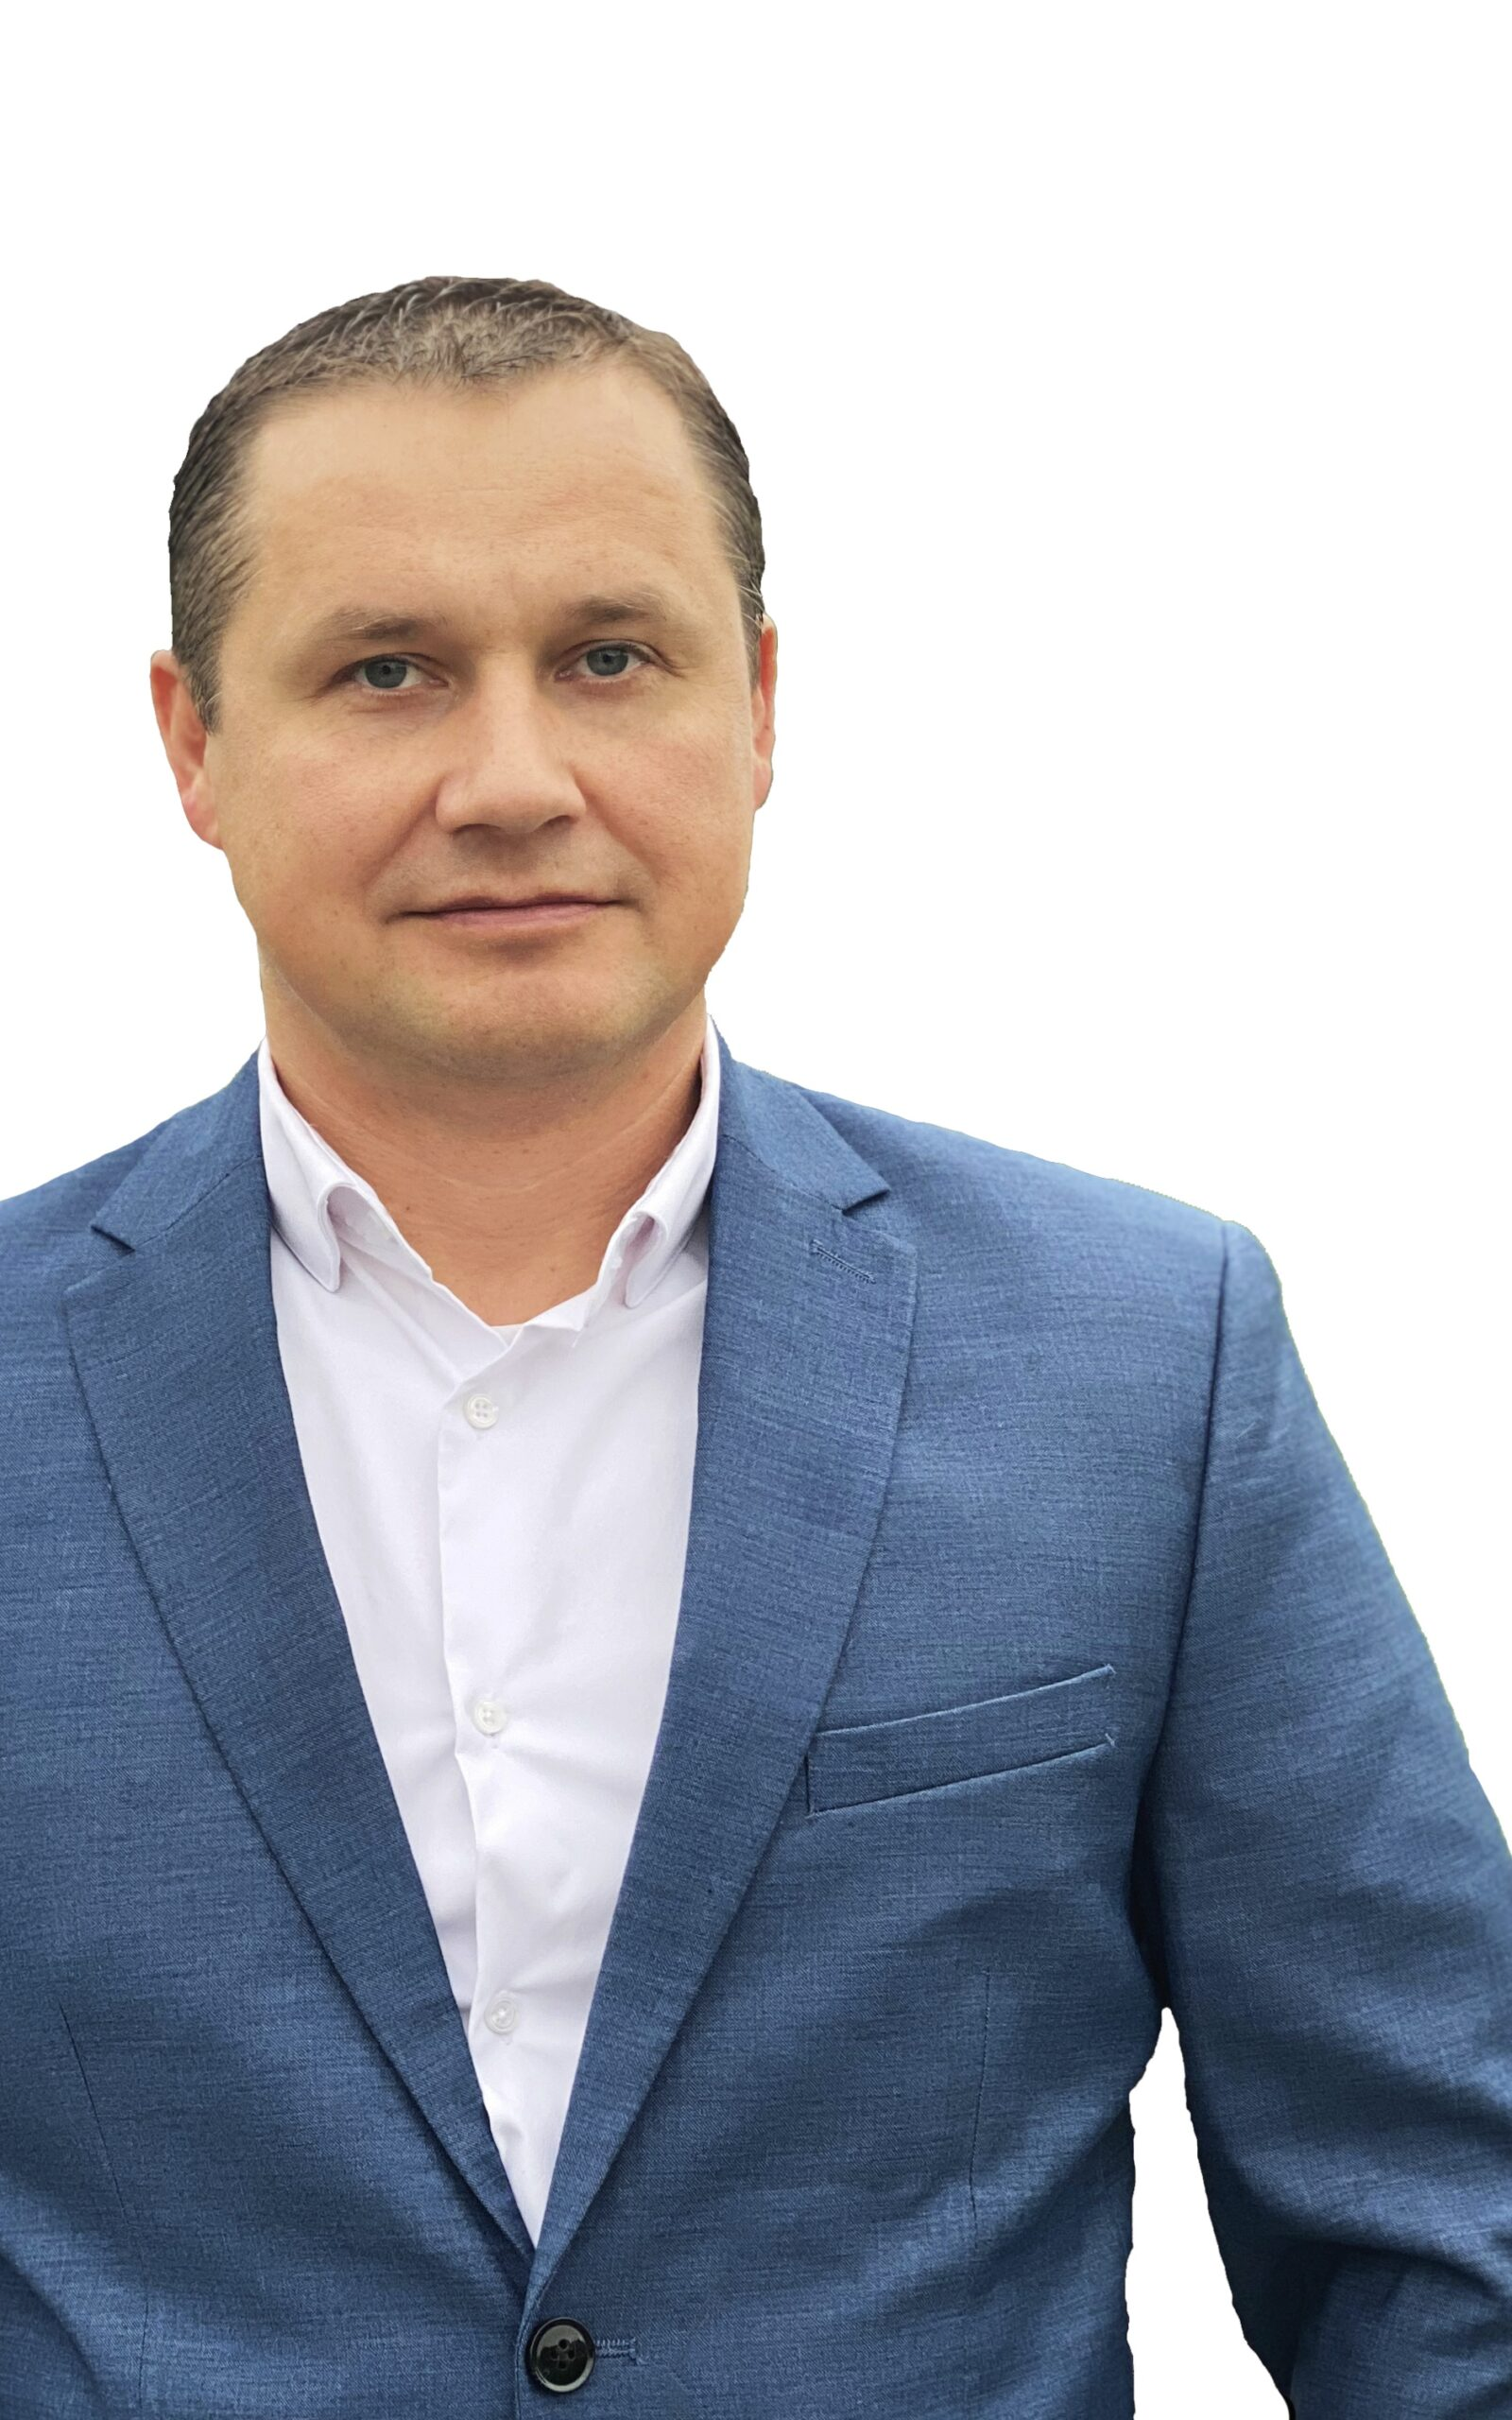 Sergey Luhavy